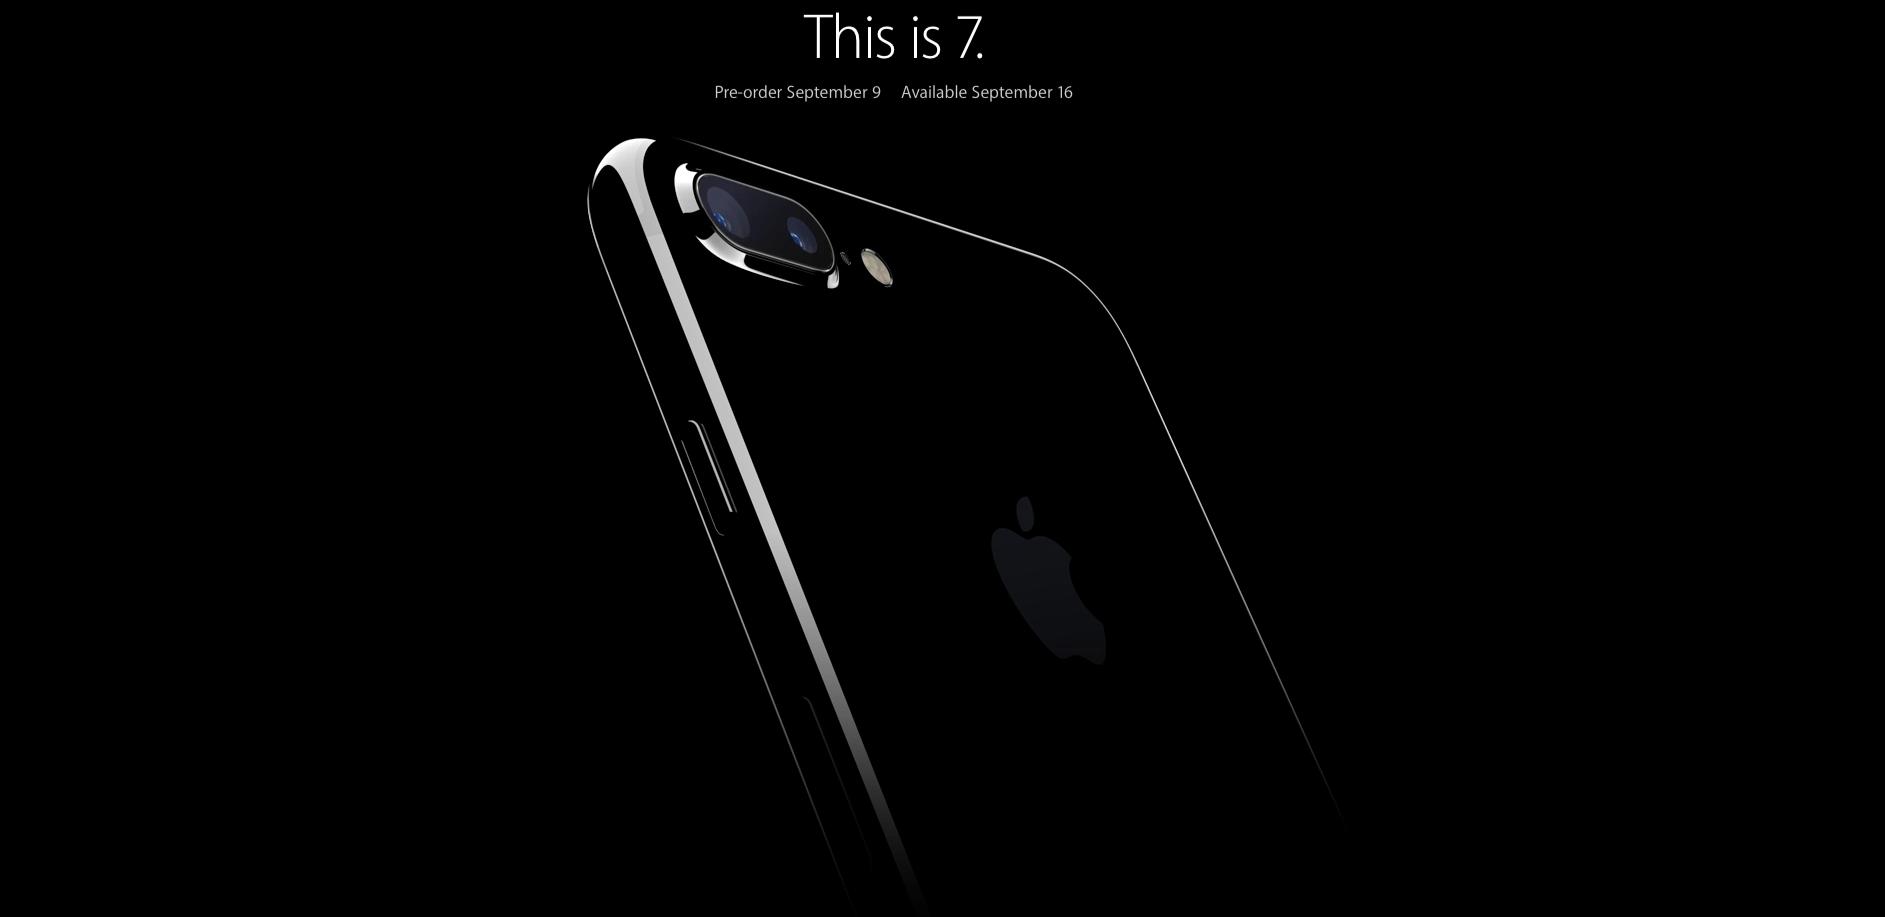 Resultado de imagem para banner iphone 7 apple